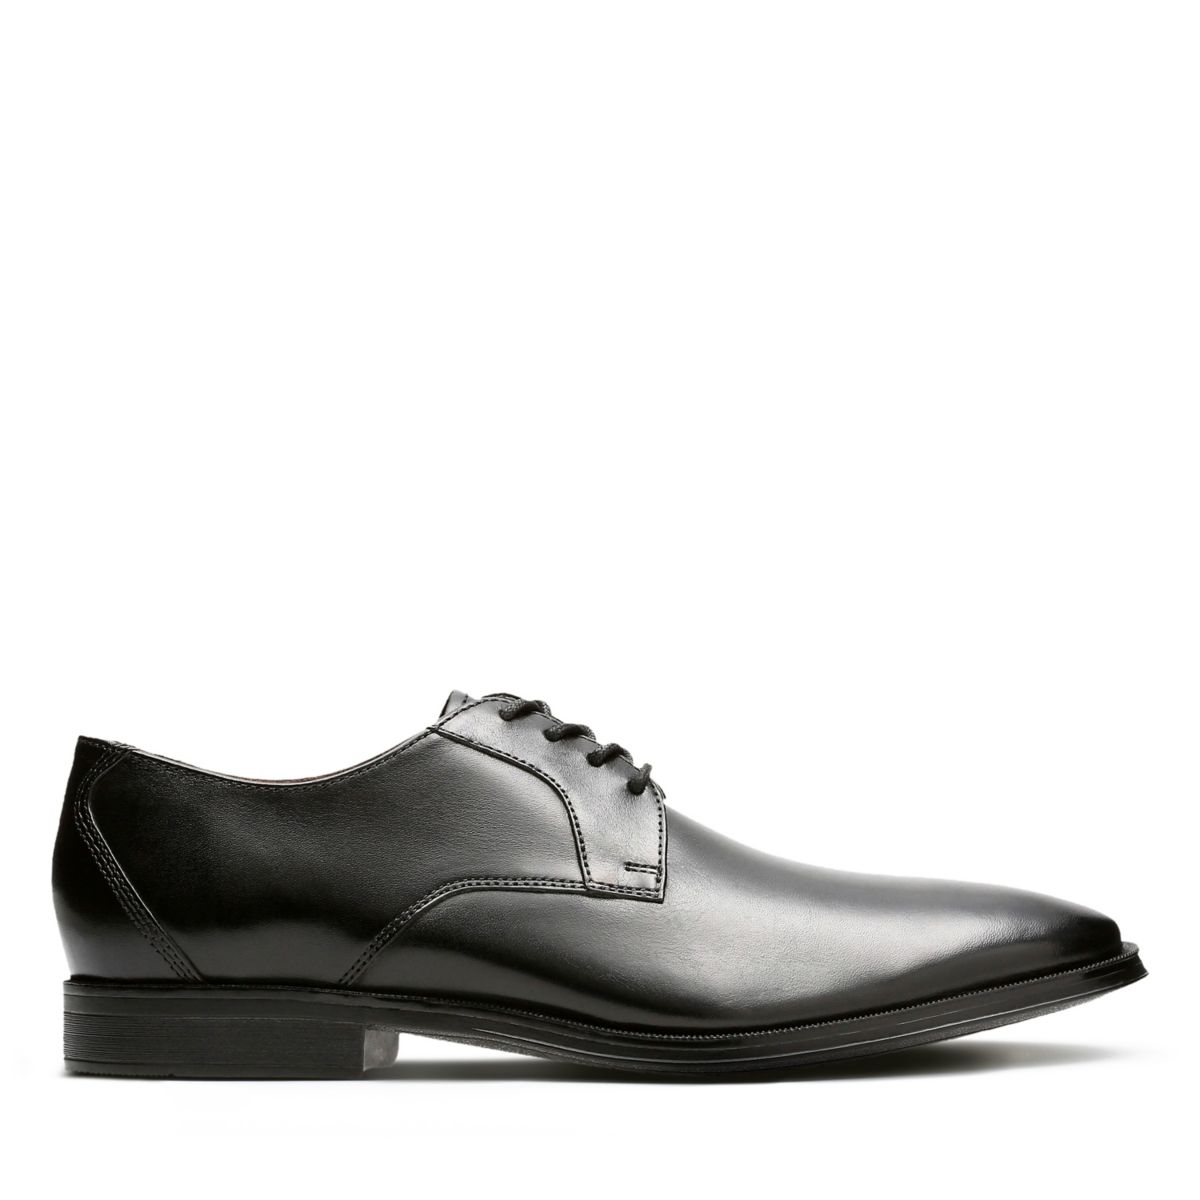 Chaussures Clarks noires Casual garçon